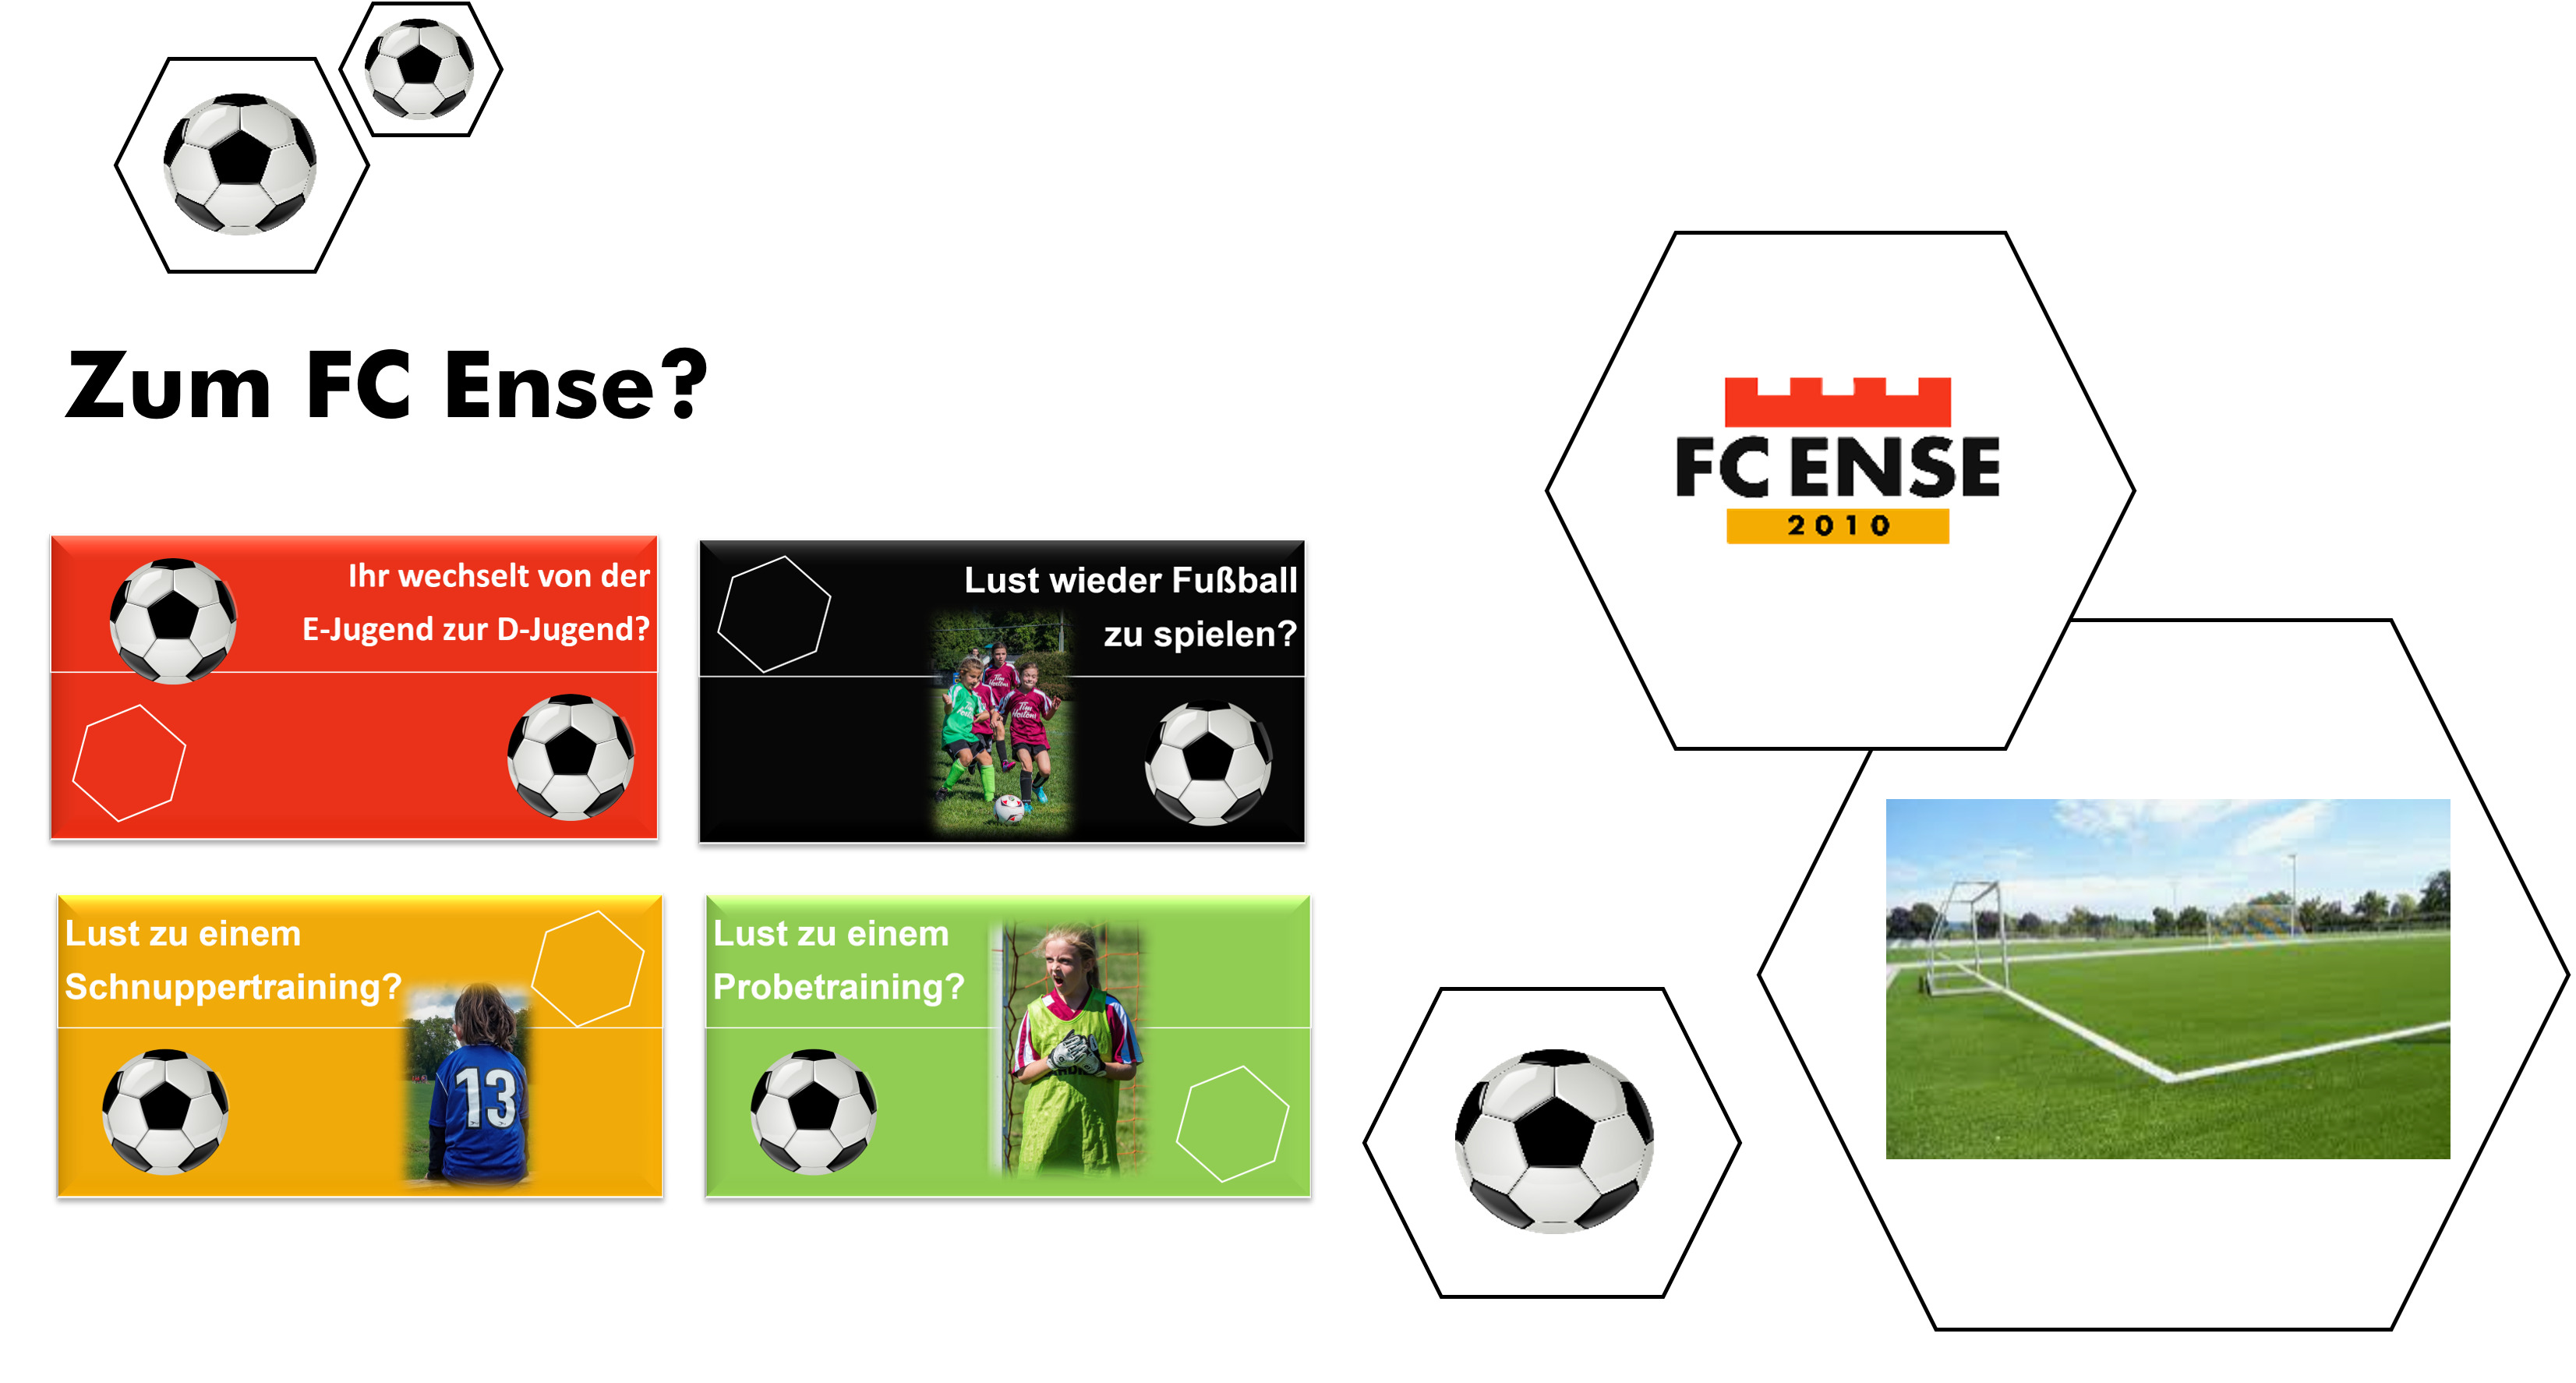 Zum FC Ense?